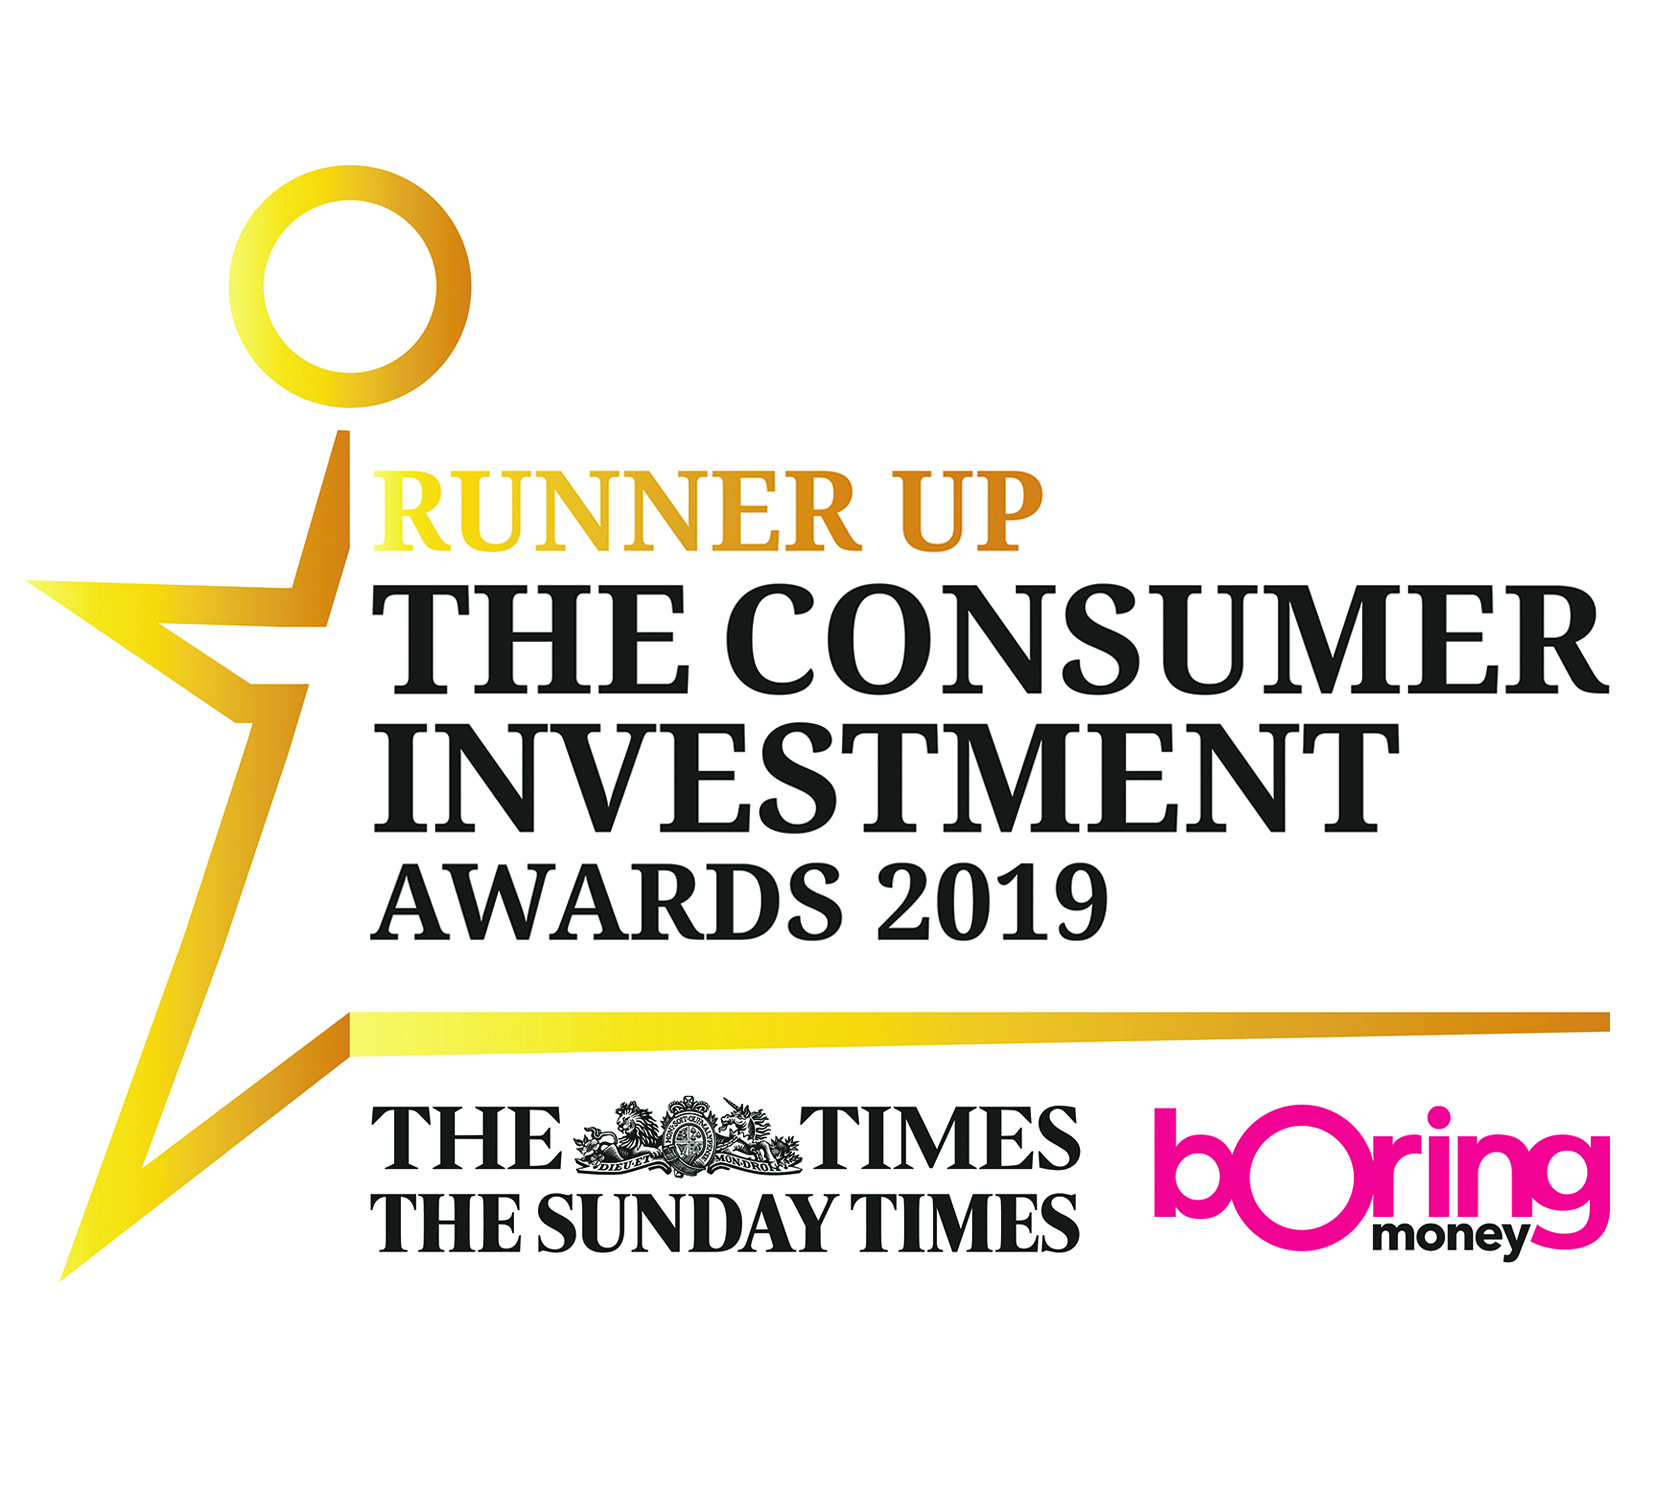 The Consumer Investment Awards - Runner Up